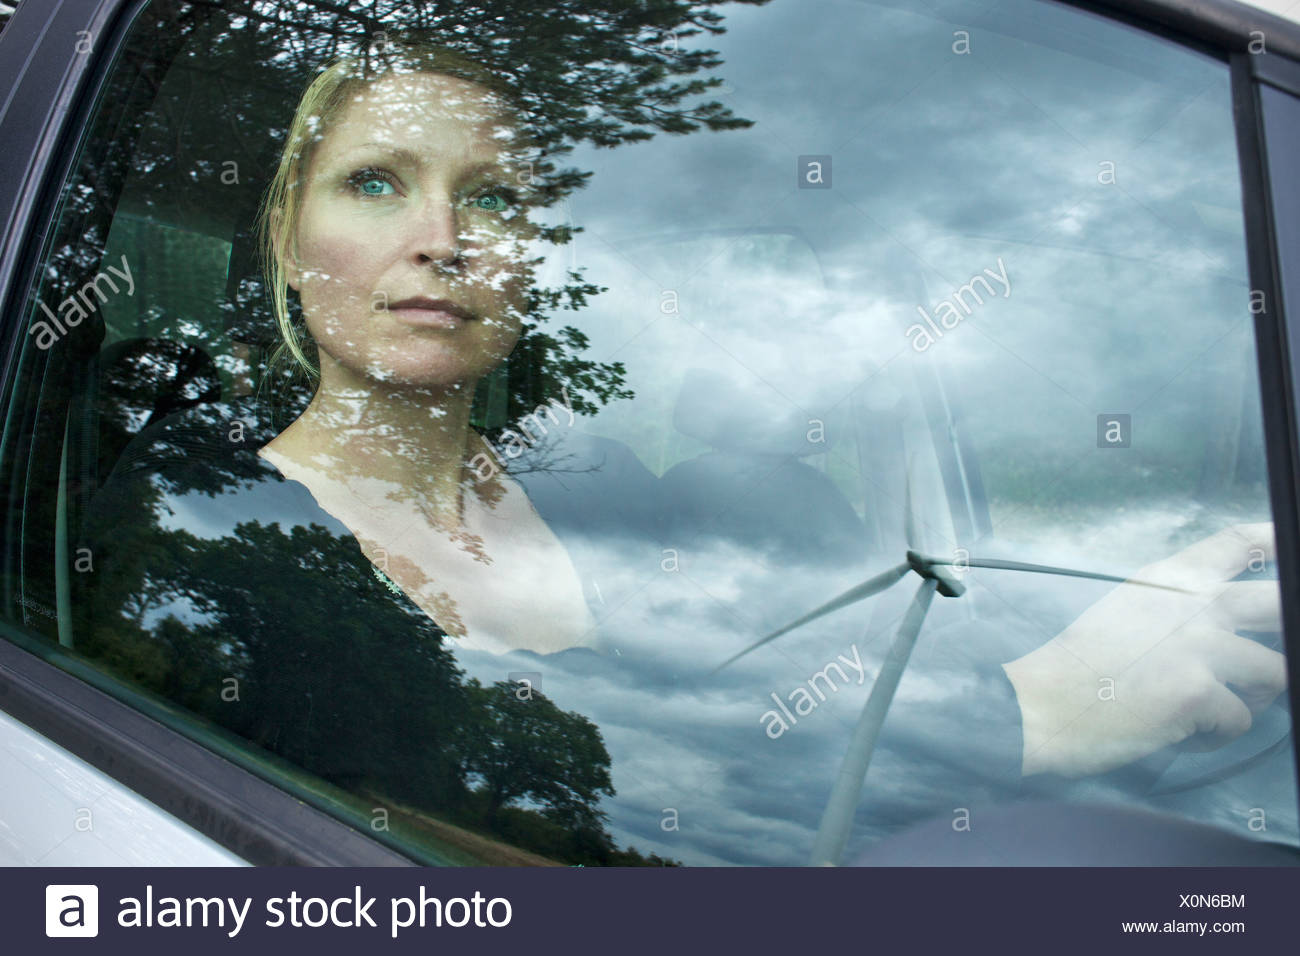 Wind turbine reflected in car window - Stock Image